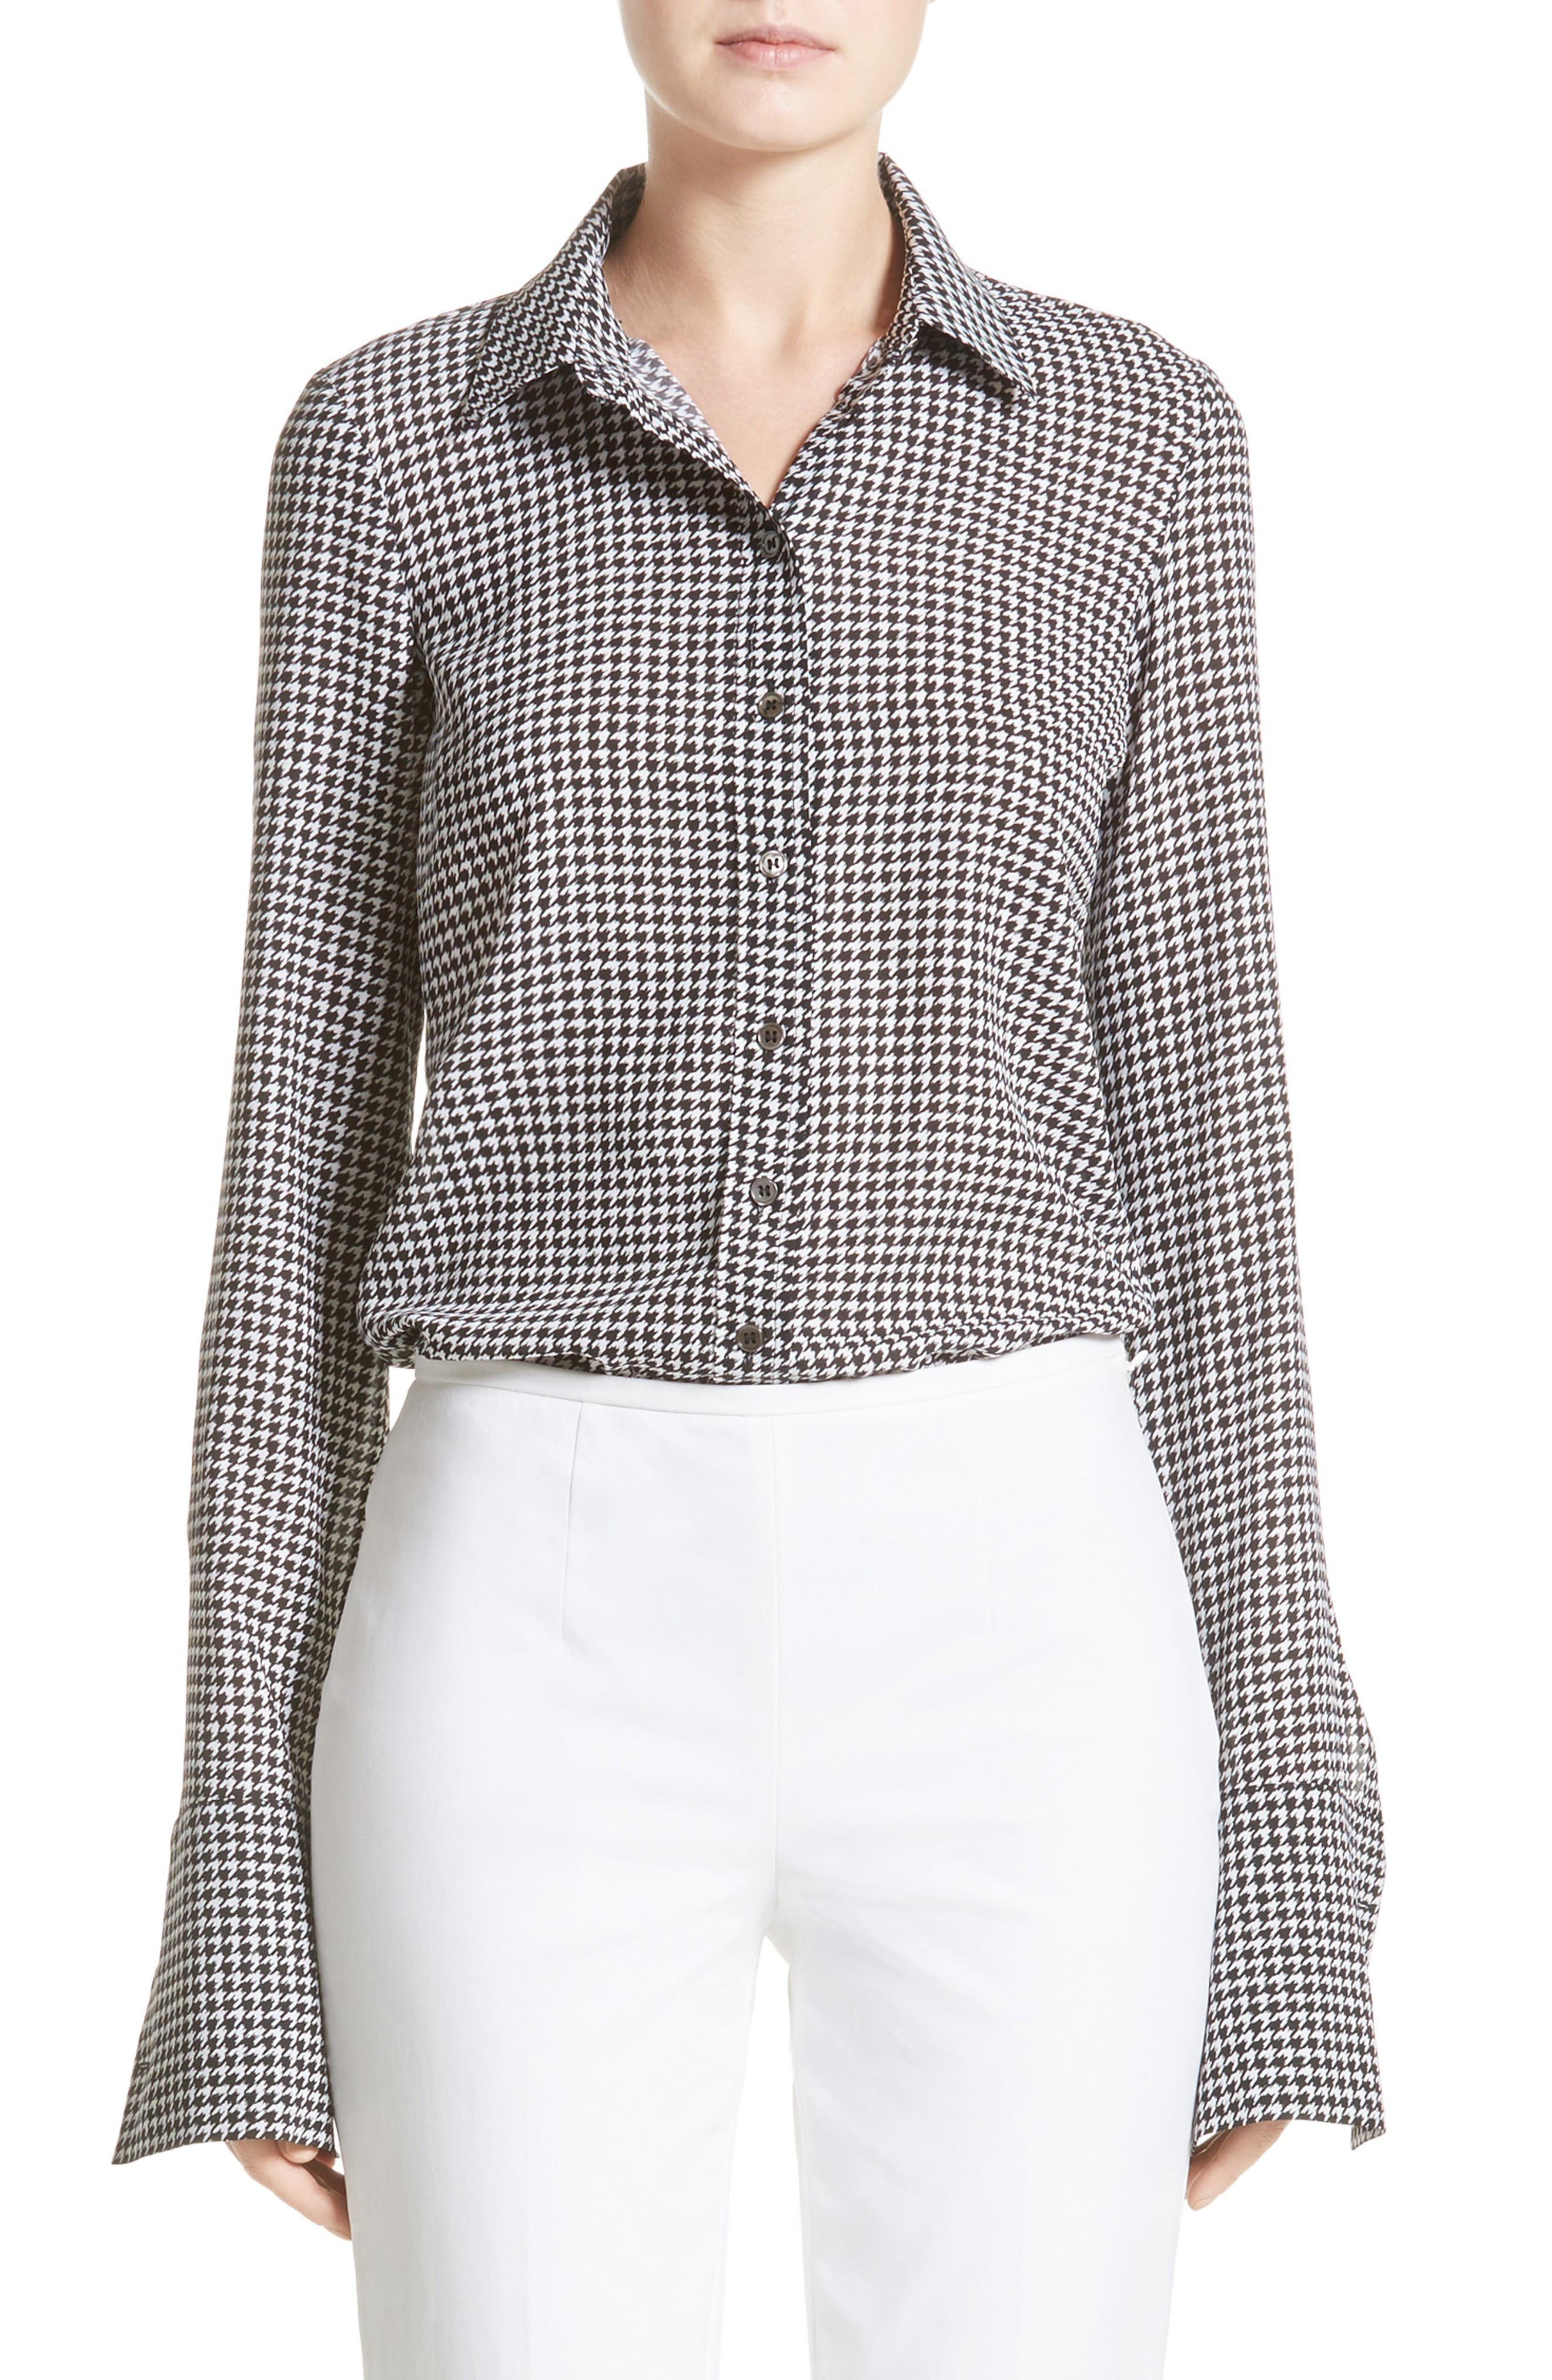 Michael Kors Houndstooth Silk Georgette Shirt